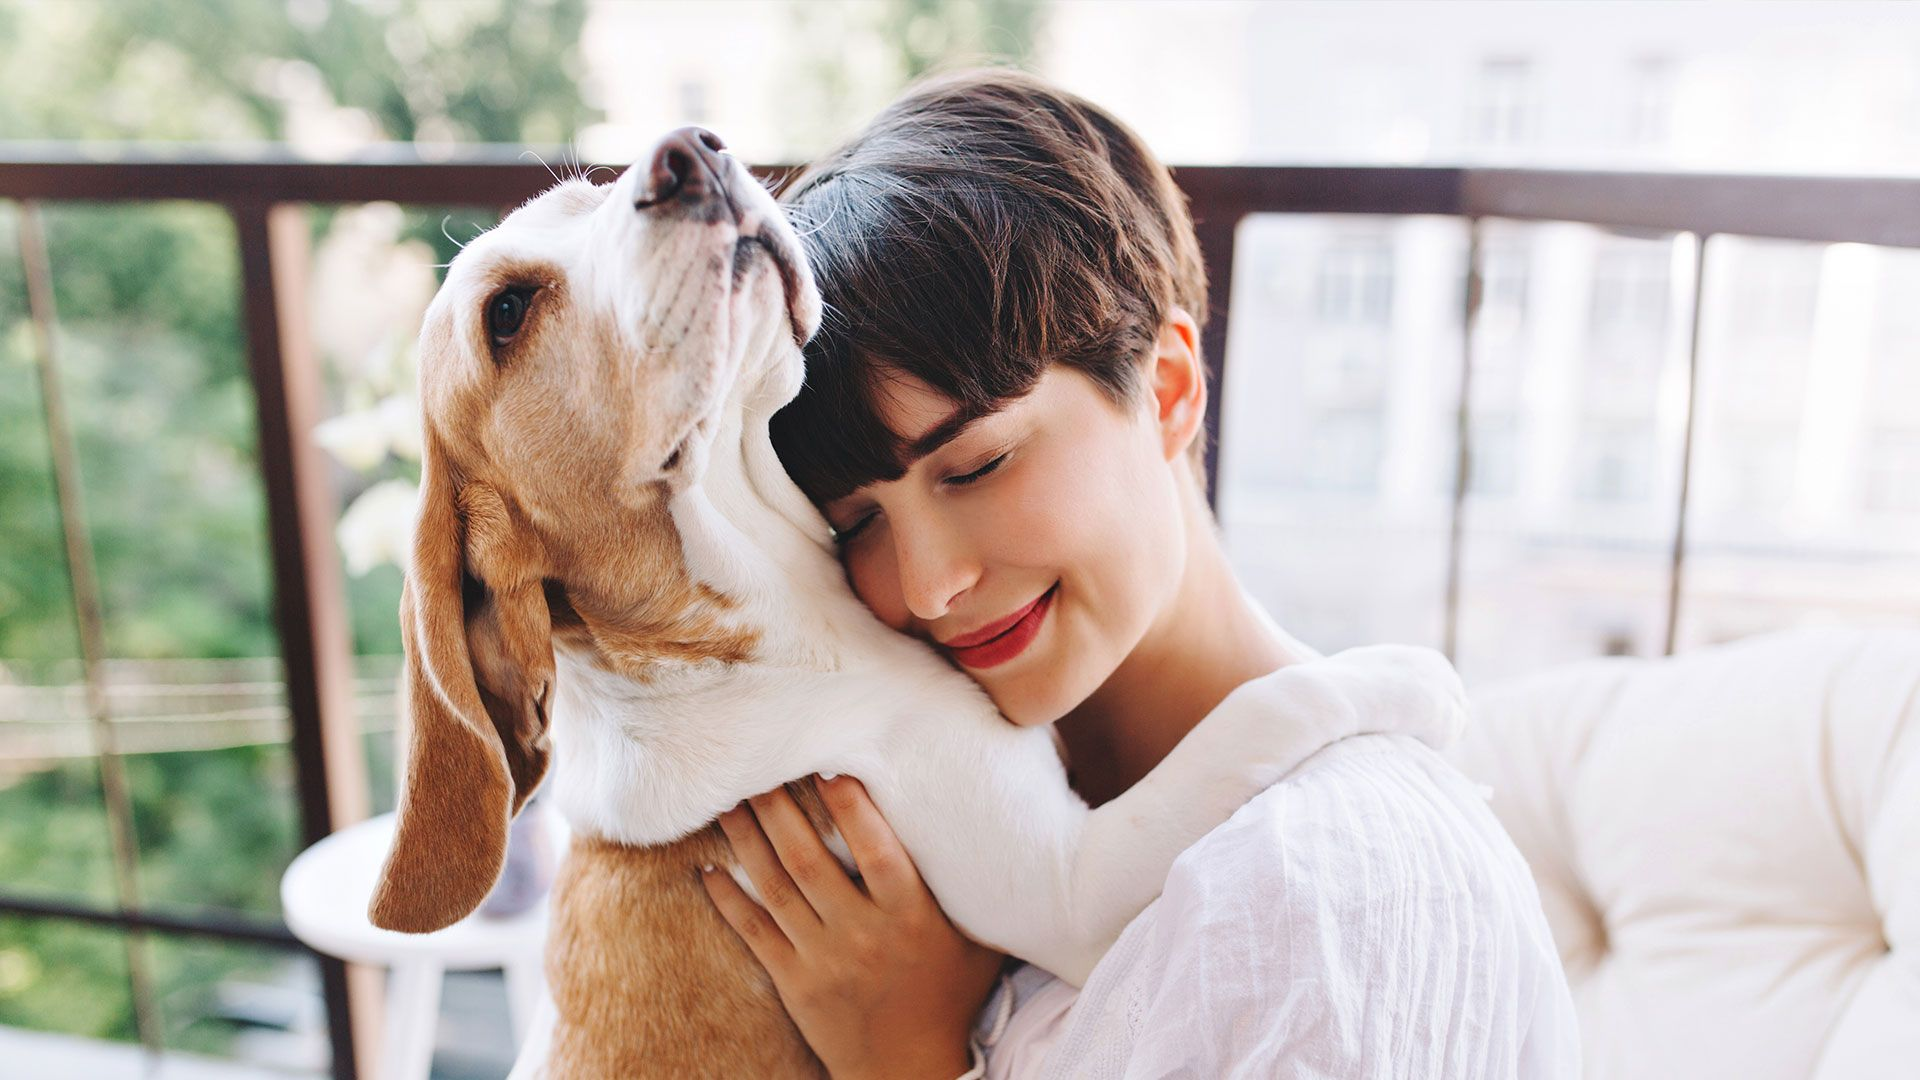 Happy Dog and Happy Woman